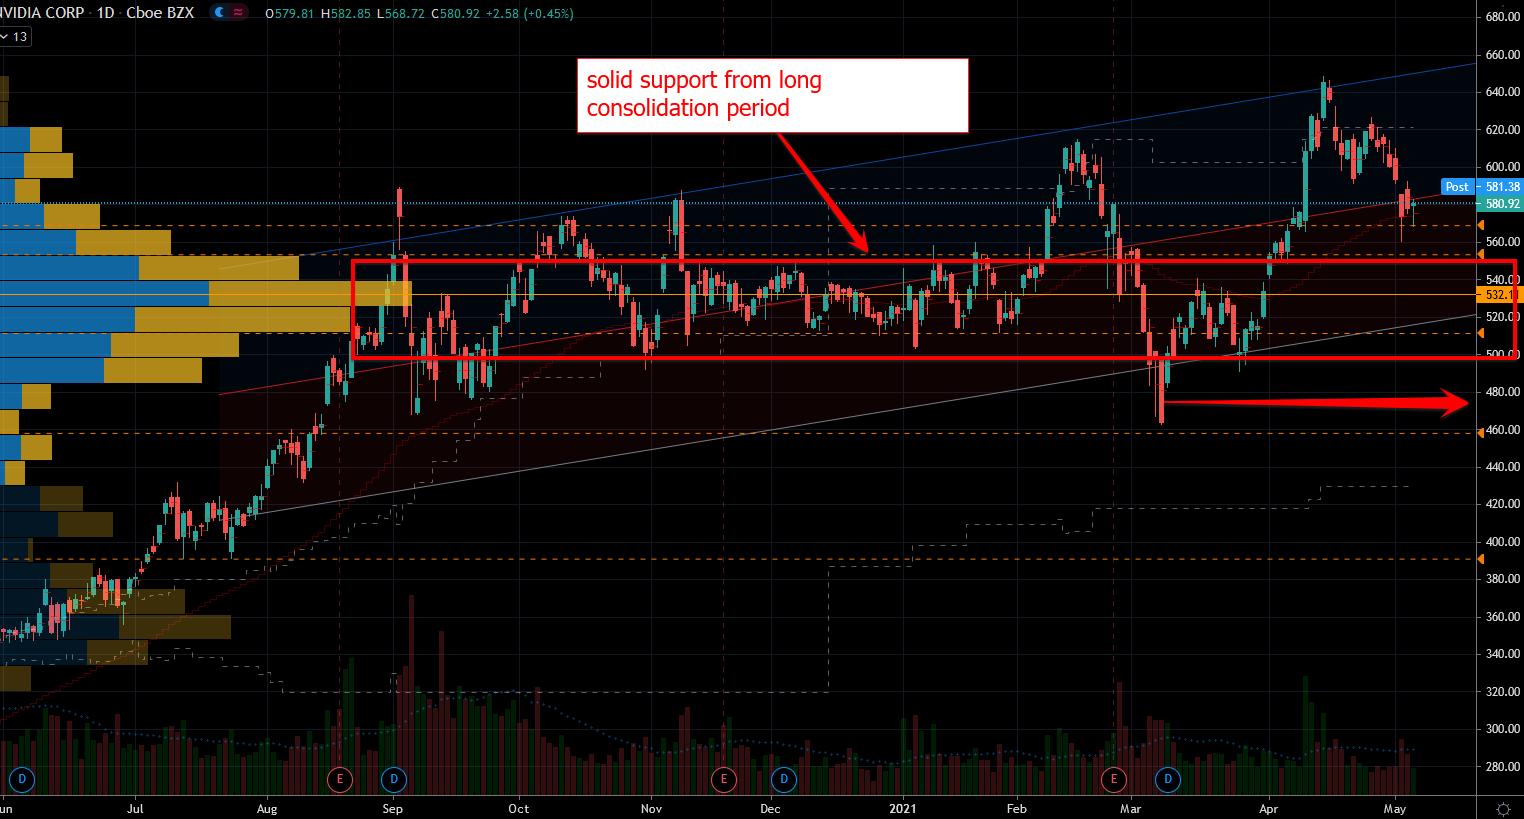 Nvidida (NVDA) Stock Chart Showing Strong Support